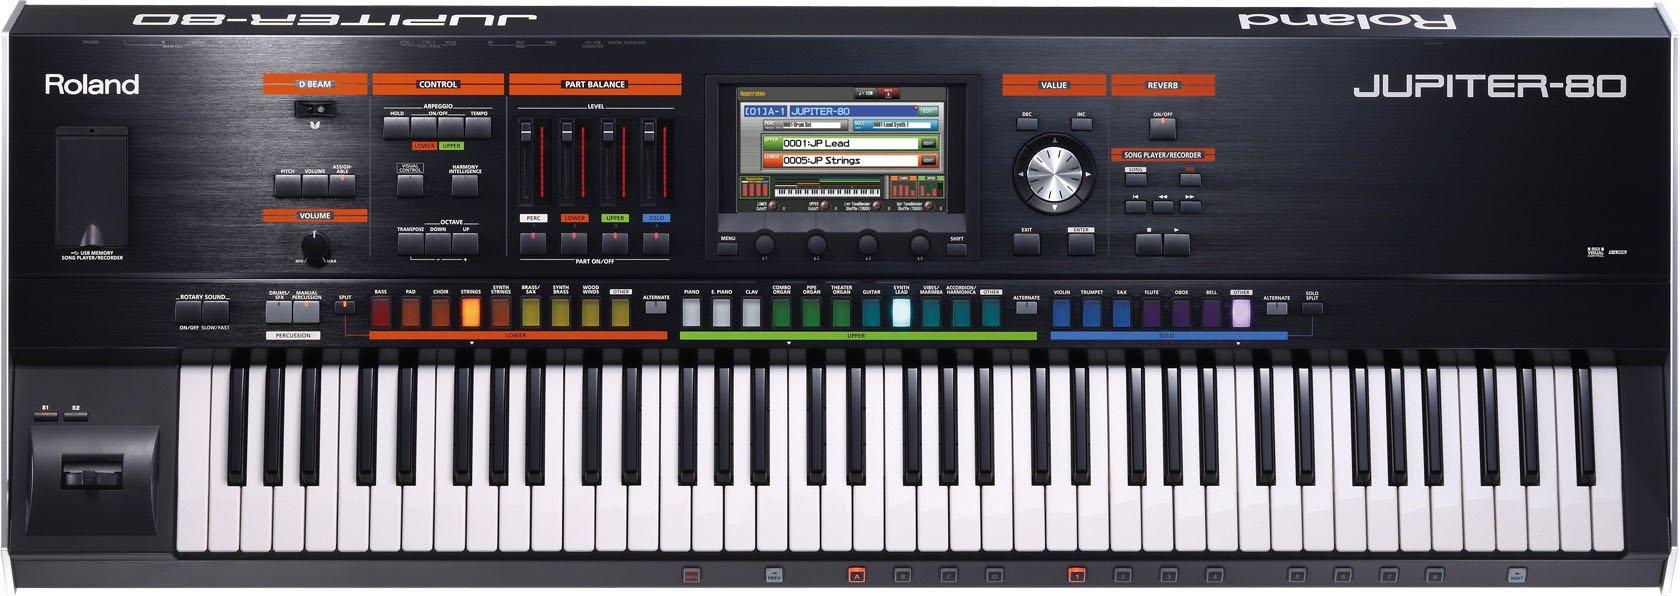 Jupiter-80 Synthesizer